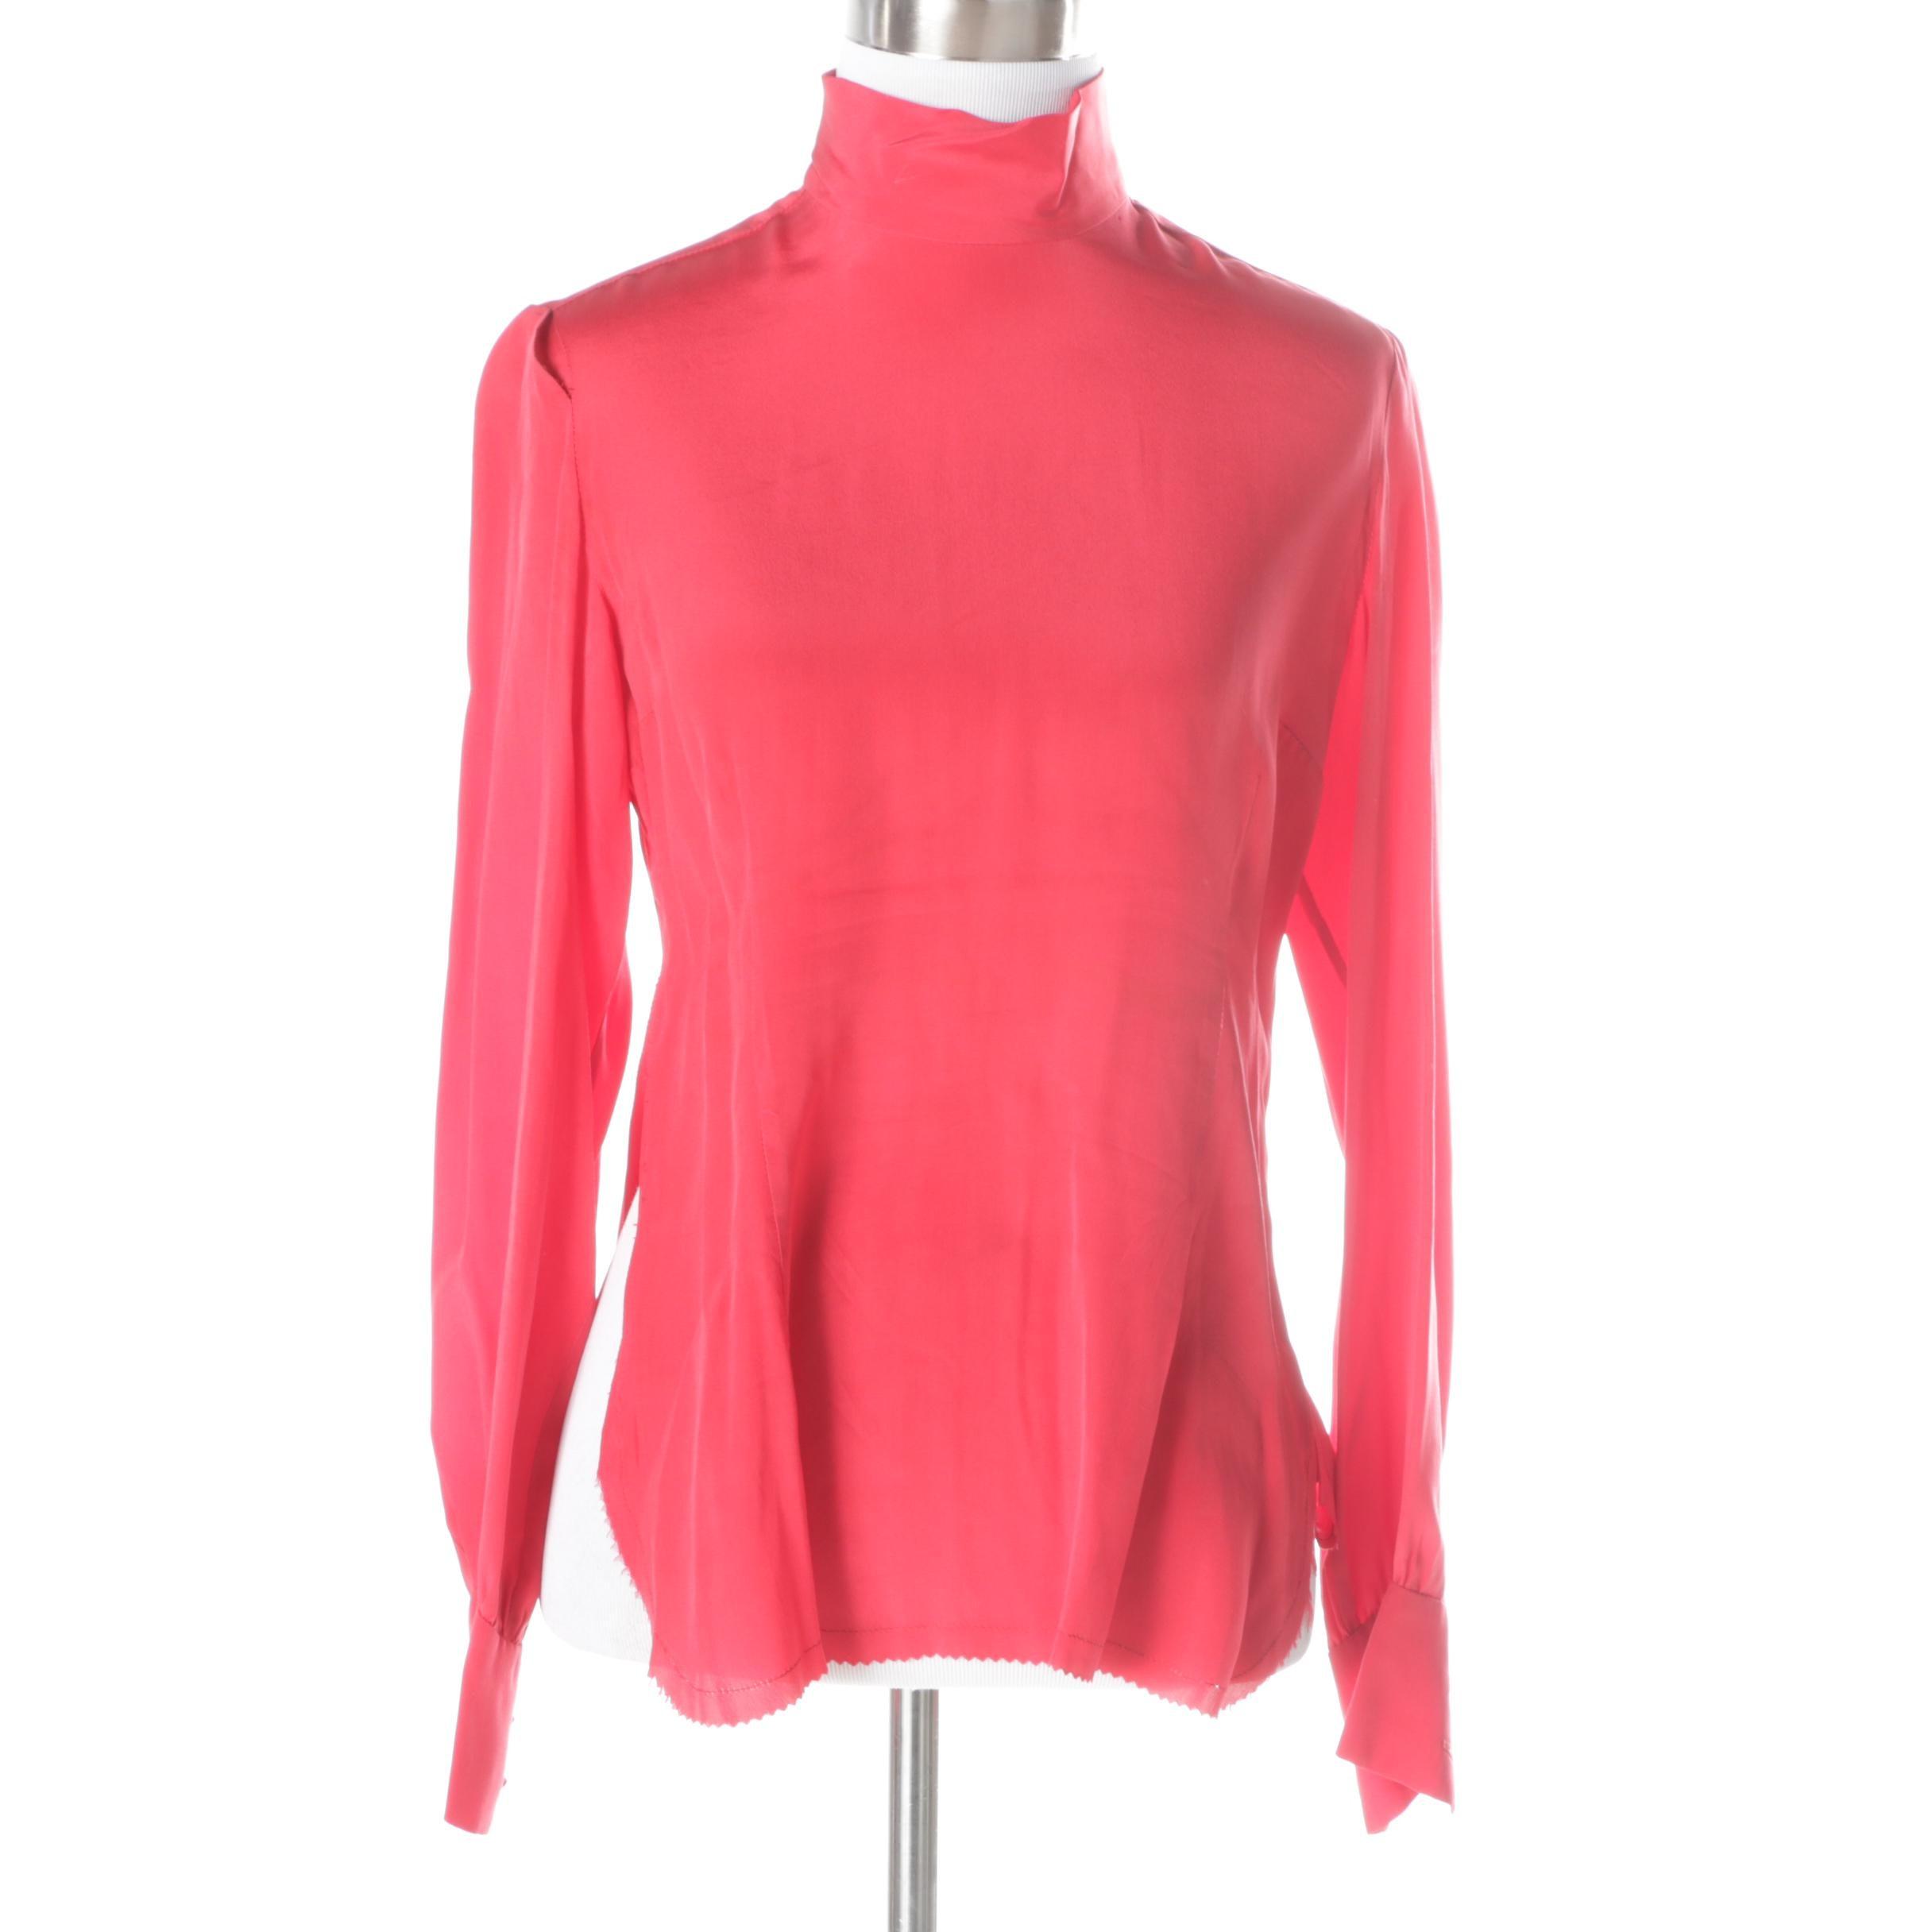 Vintage Cardinali Silk Top